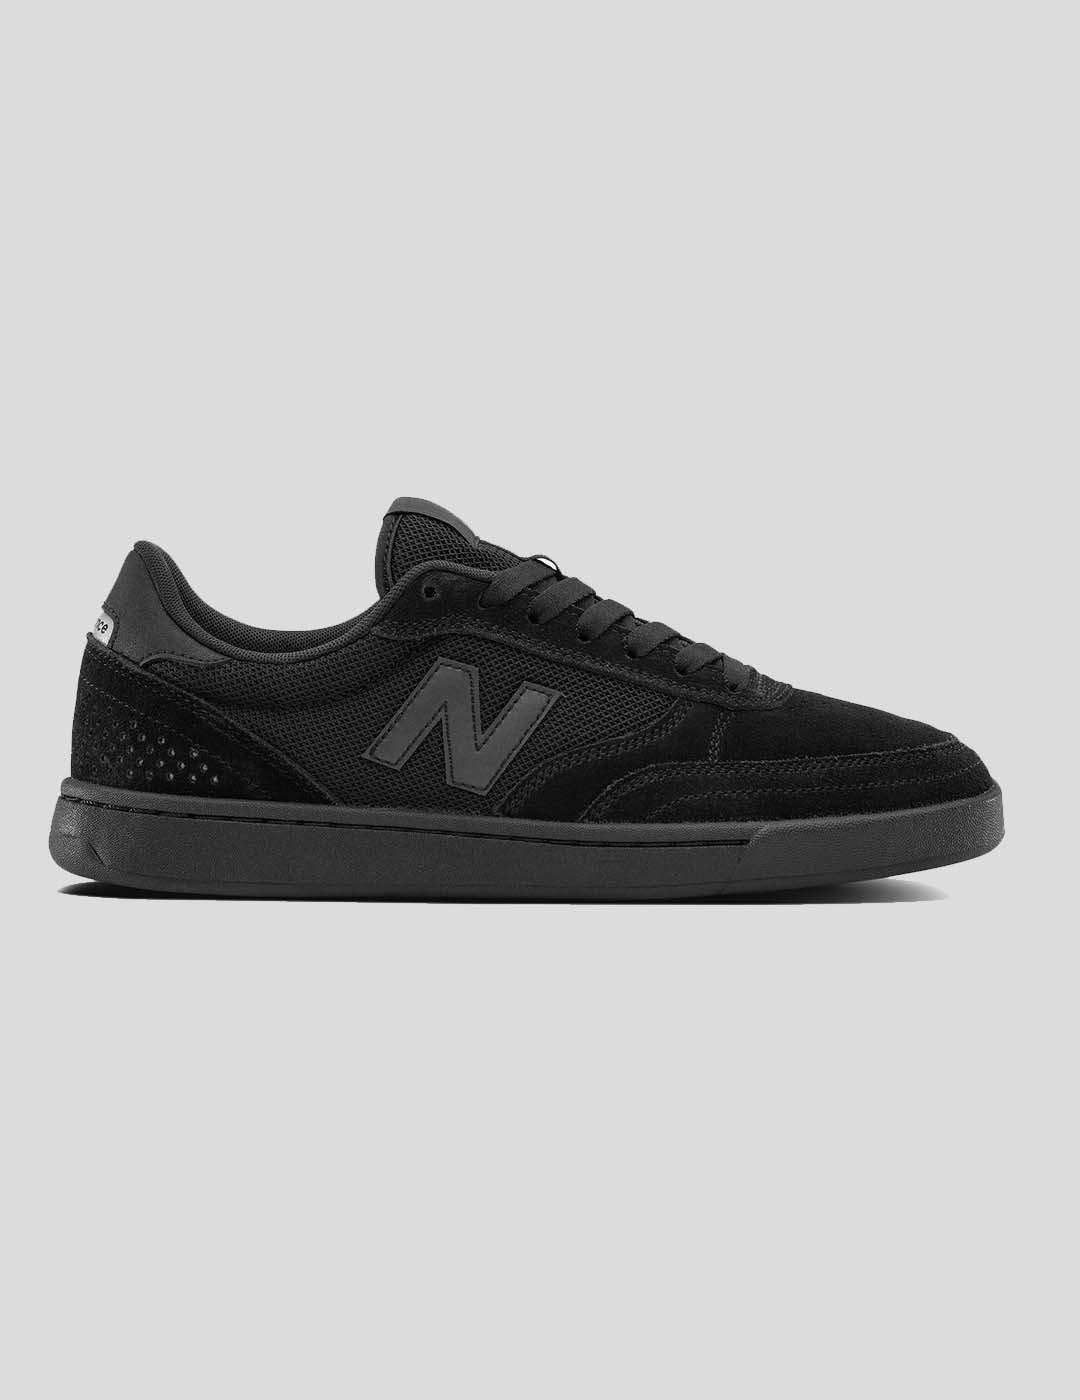 ZAPATILLAS NEW BALANCE NUMERIC 440 BLACK